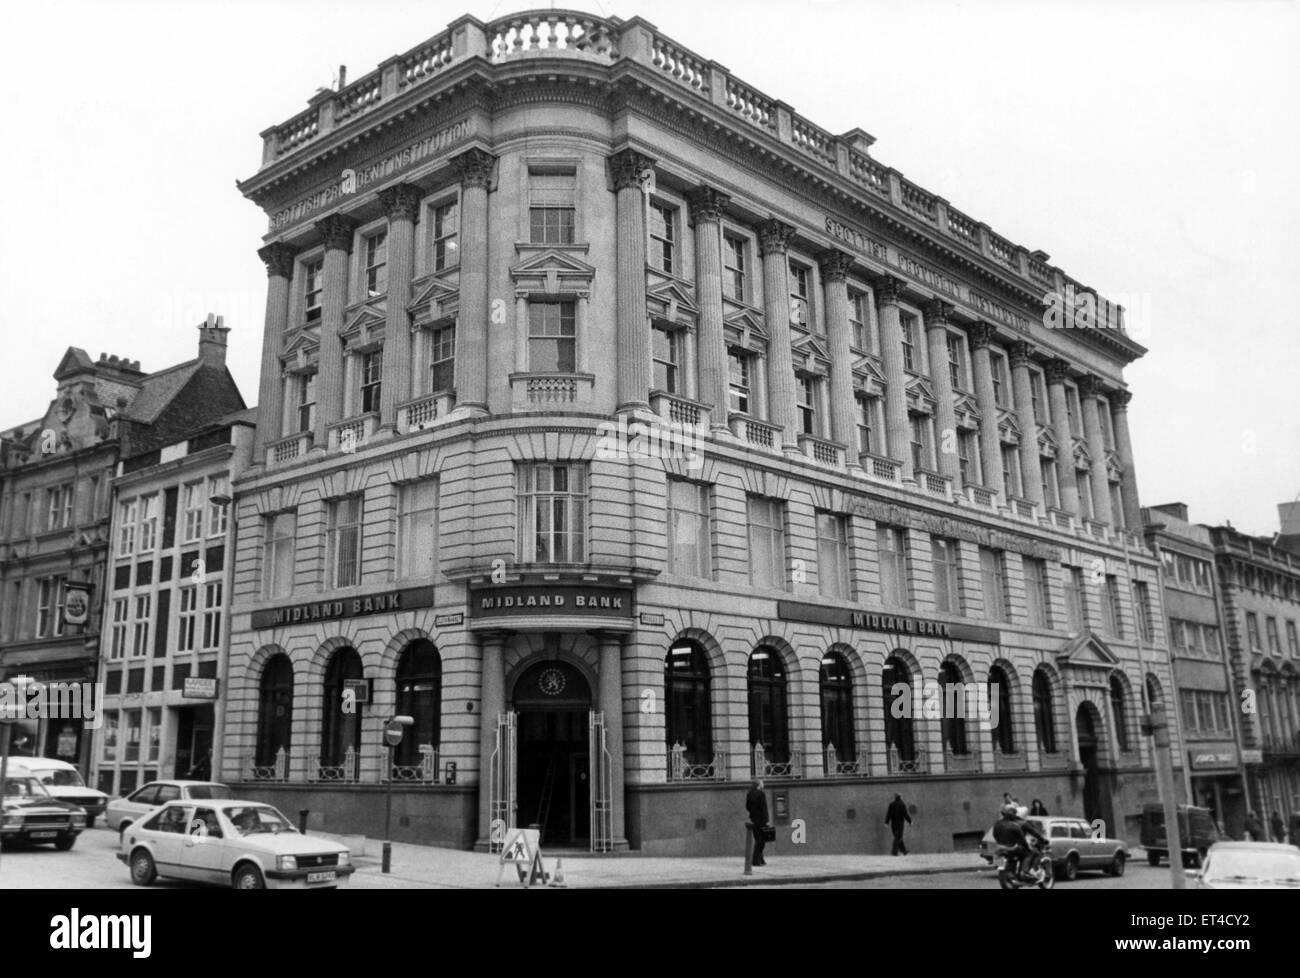 Midland Bank, Newcastle. 20 février 1983. Photo Stock